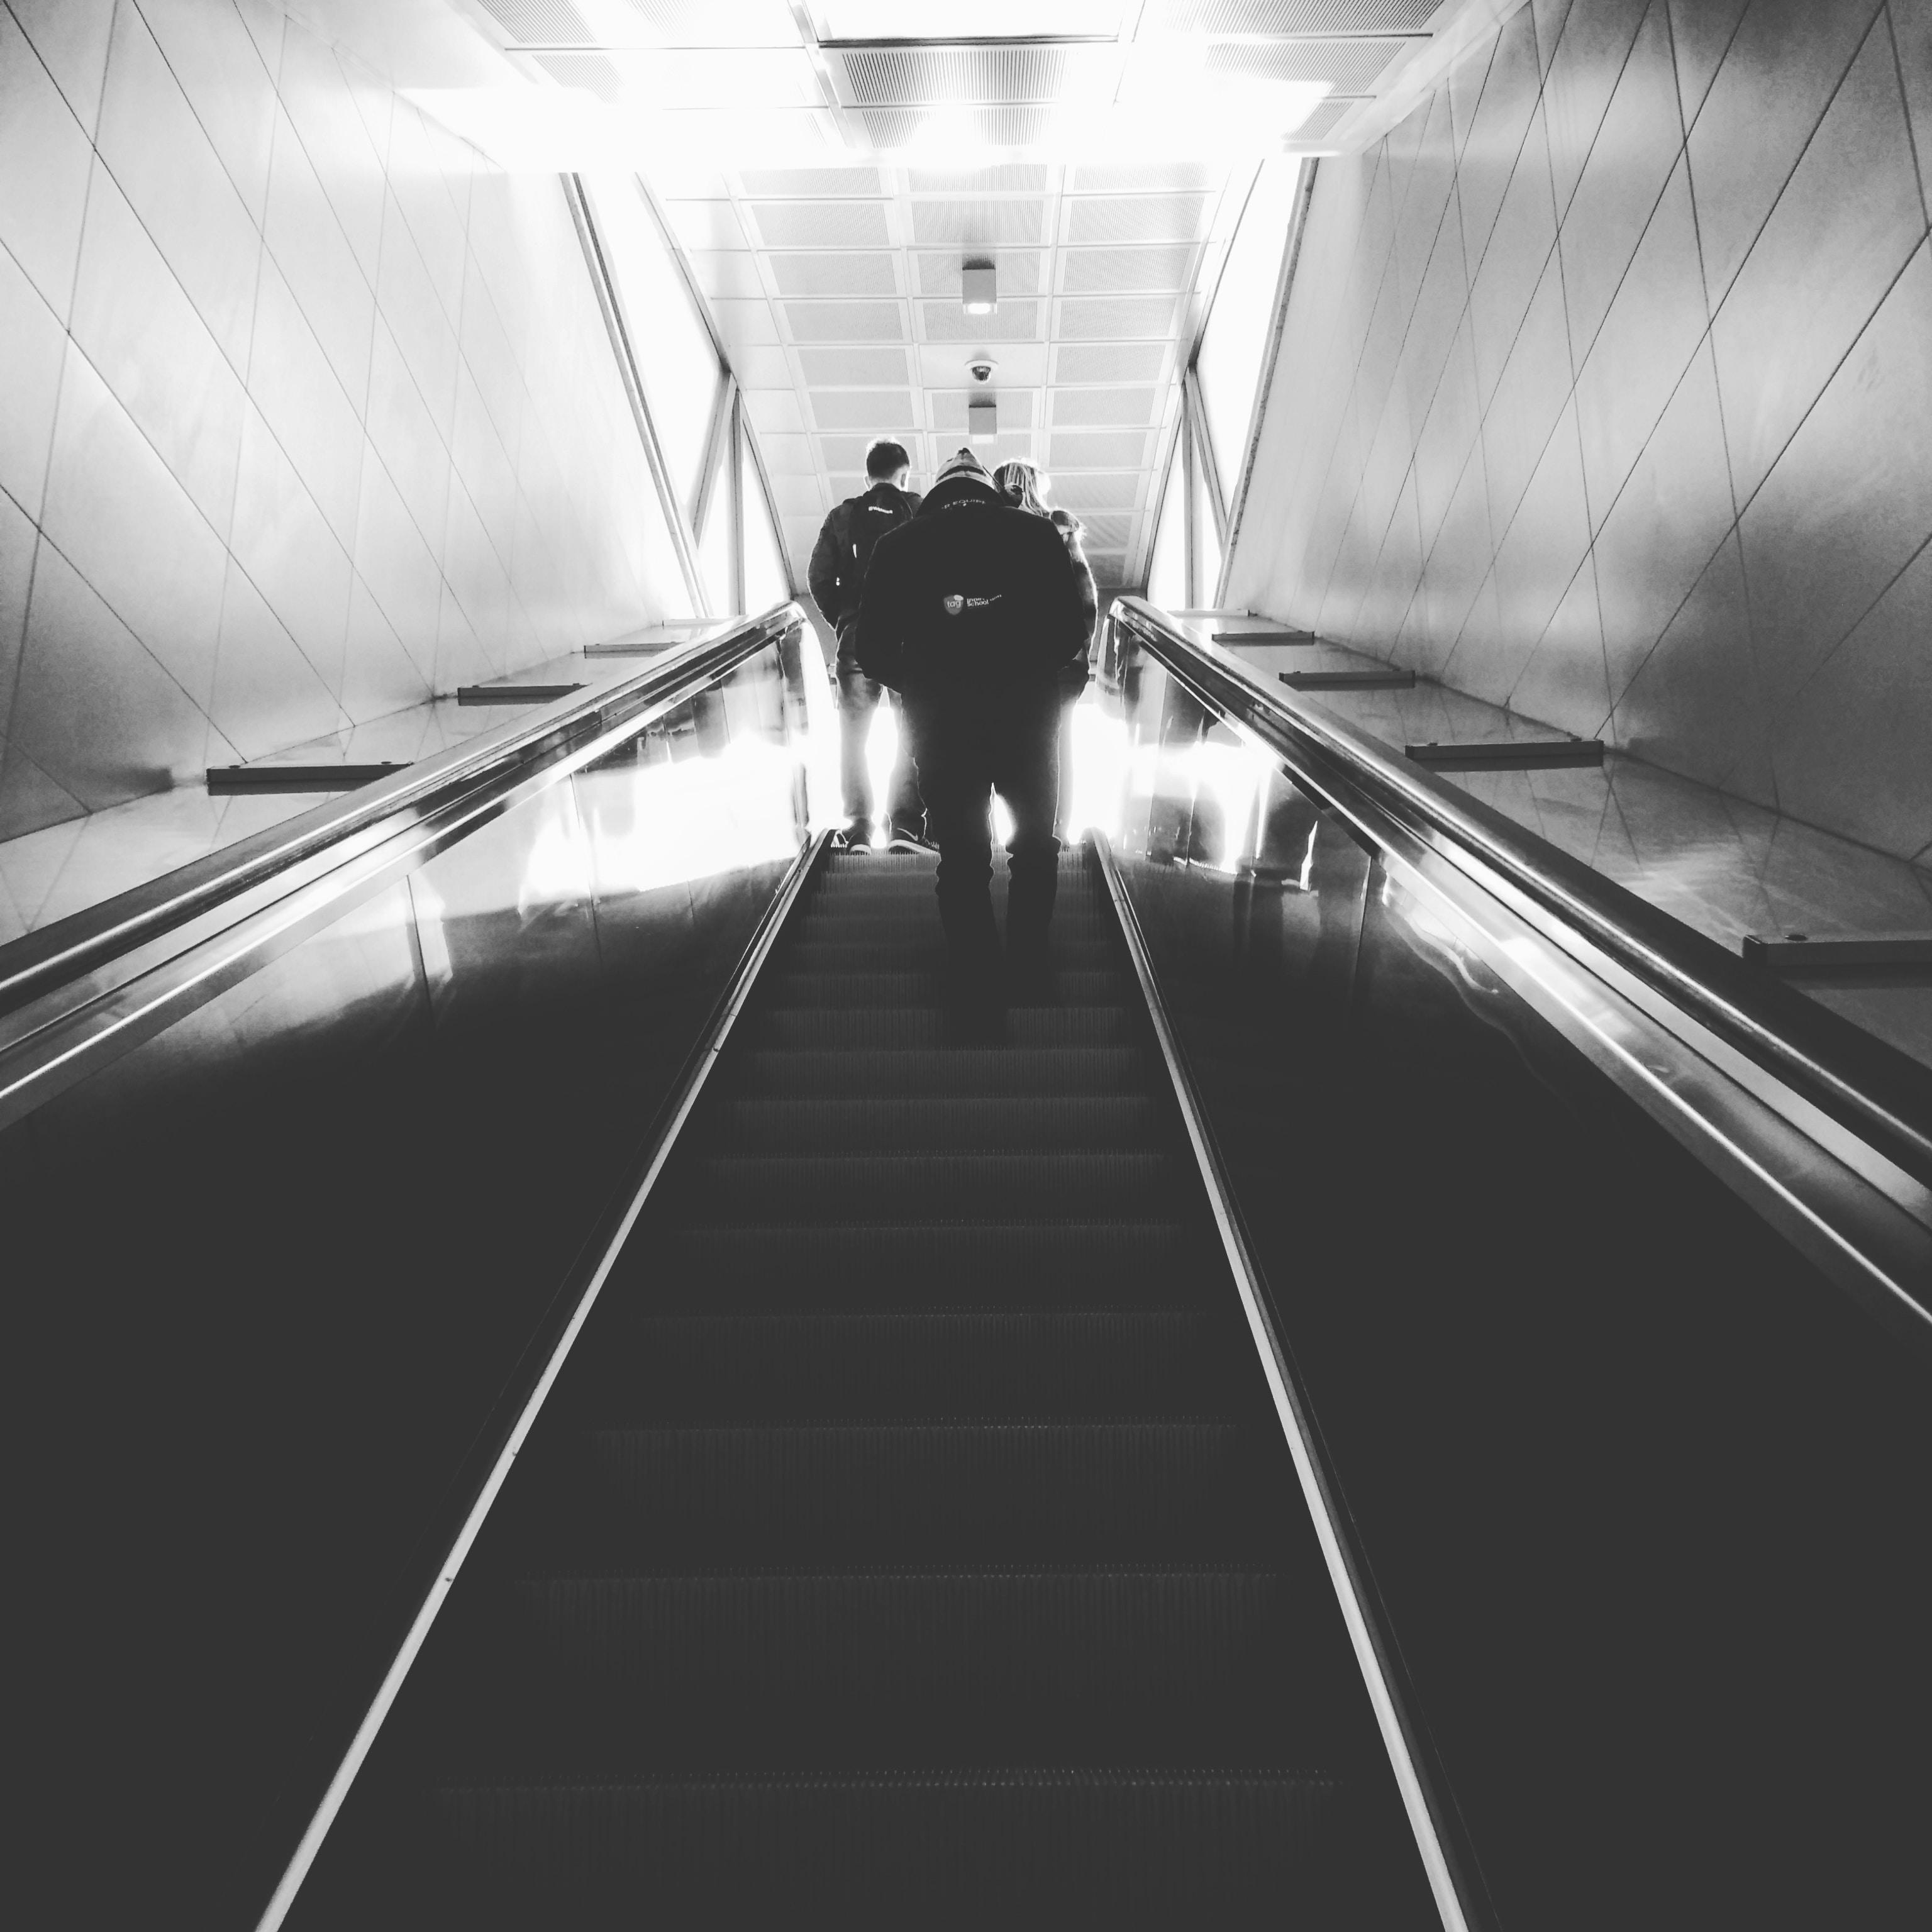 grayscale photography of man on escalator